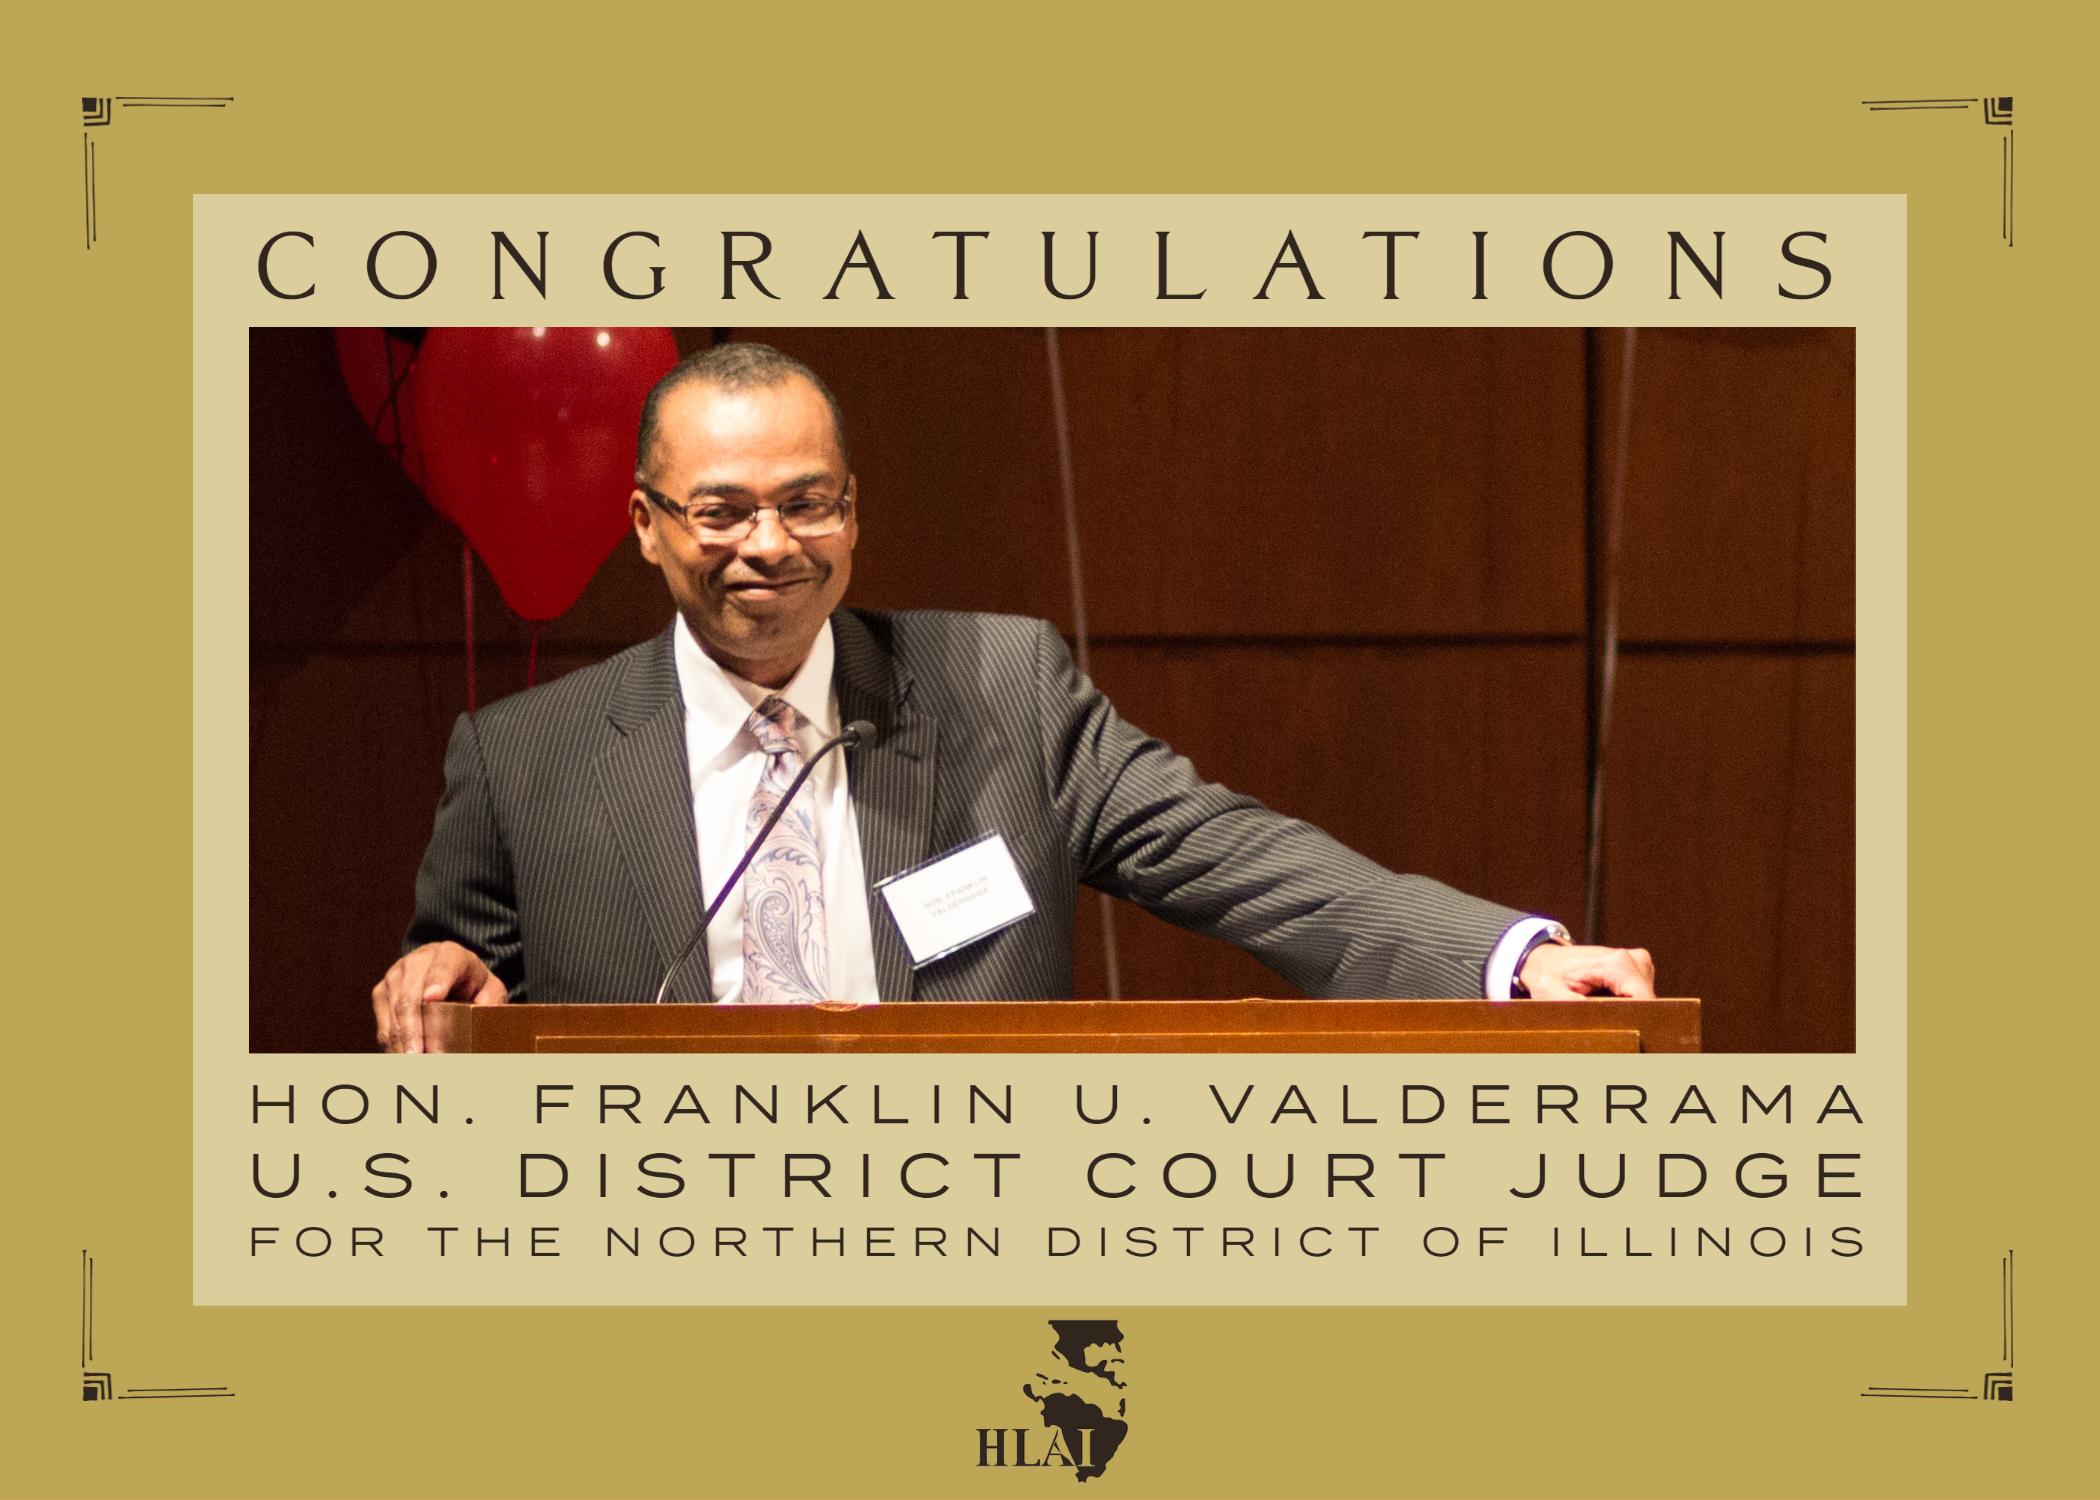 Congratulations Hon. Franklin U. Valderrama